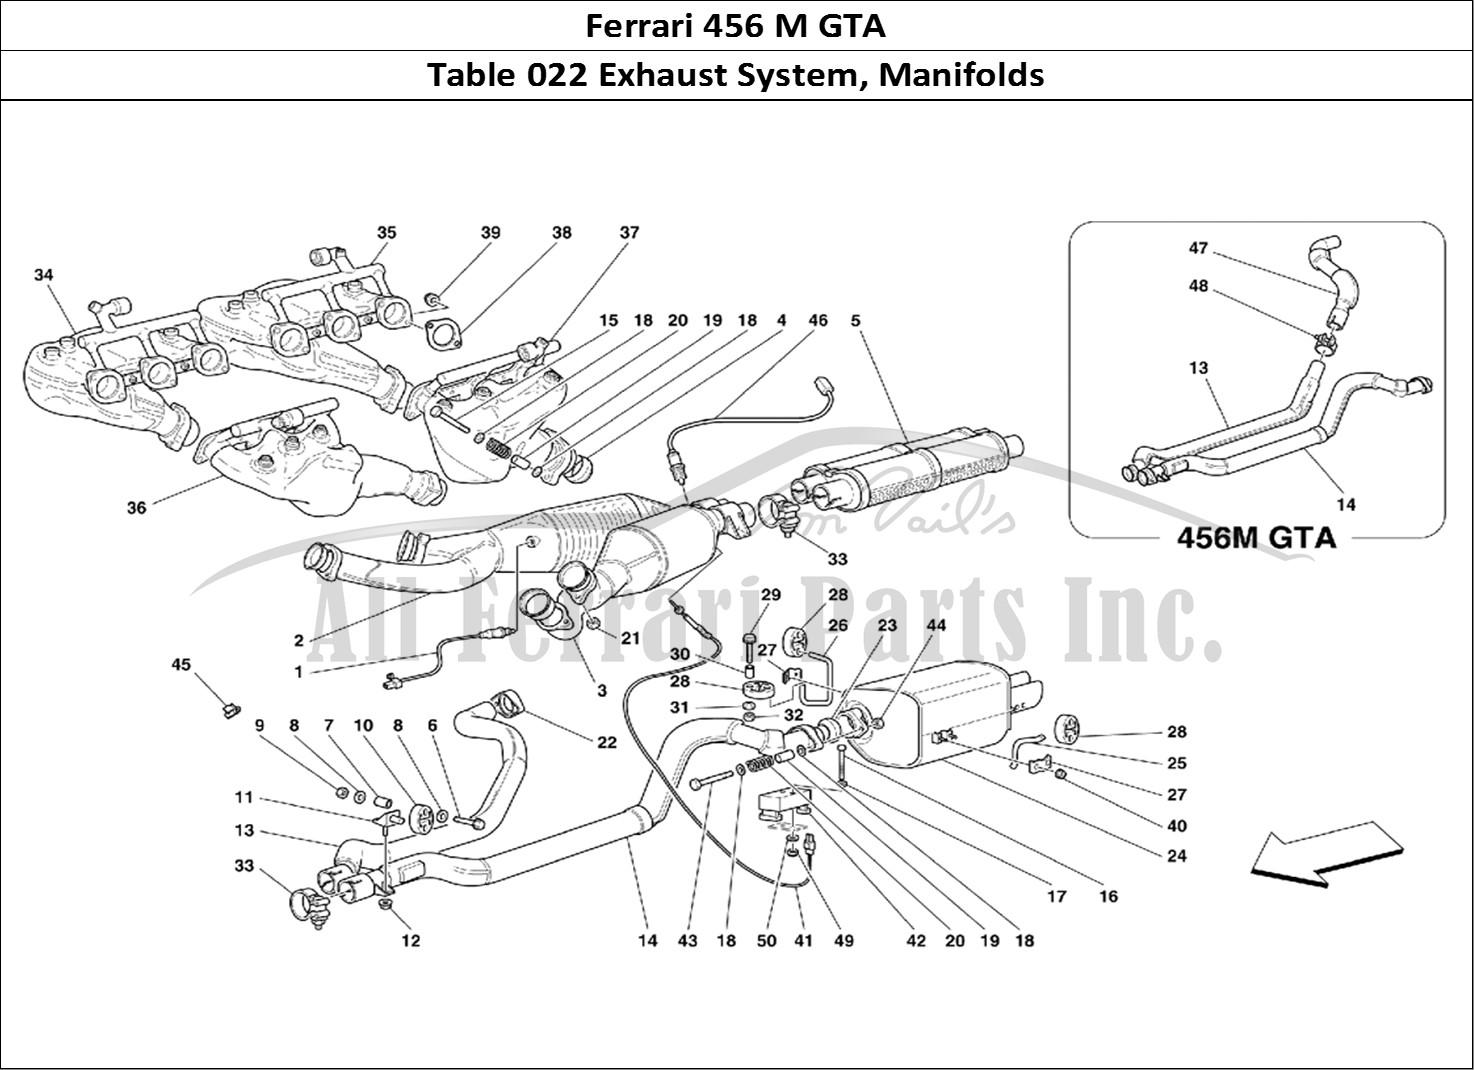 ferrari 456 m gta mechanical table 022 exhaust system, manifolds